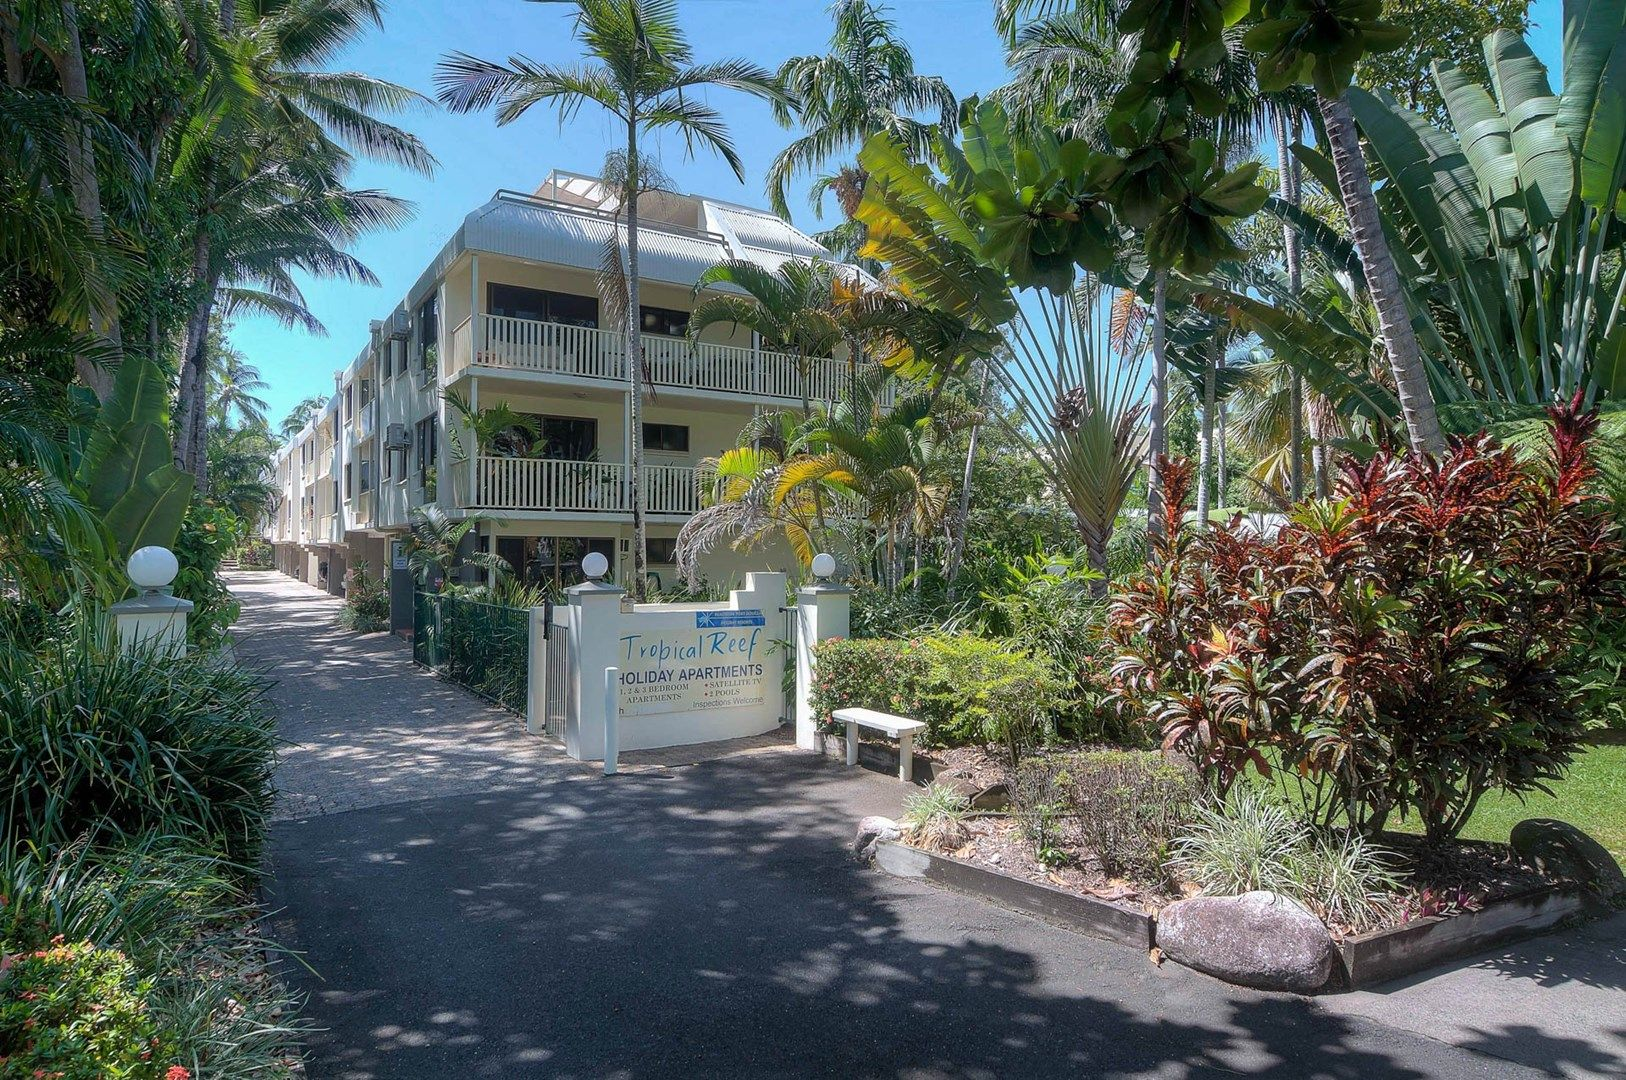 17 Tropical Reef/10 Davidson Street, Port Douglas QLD 4877, Image 2